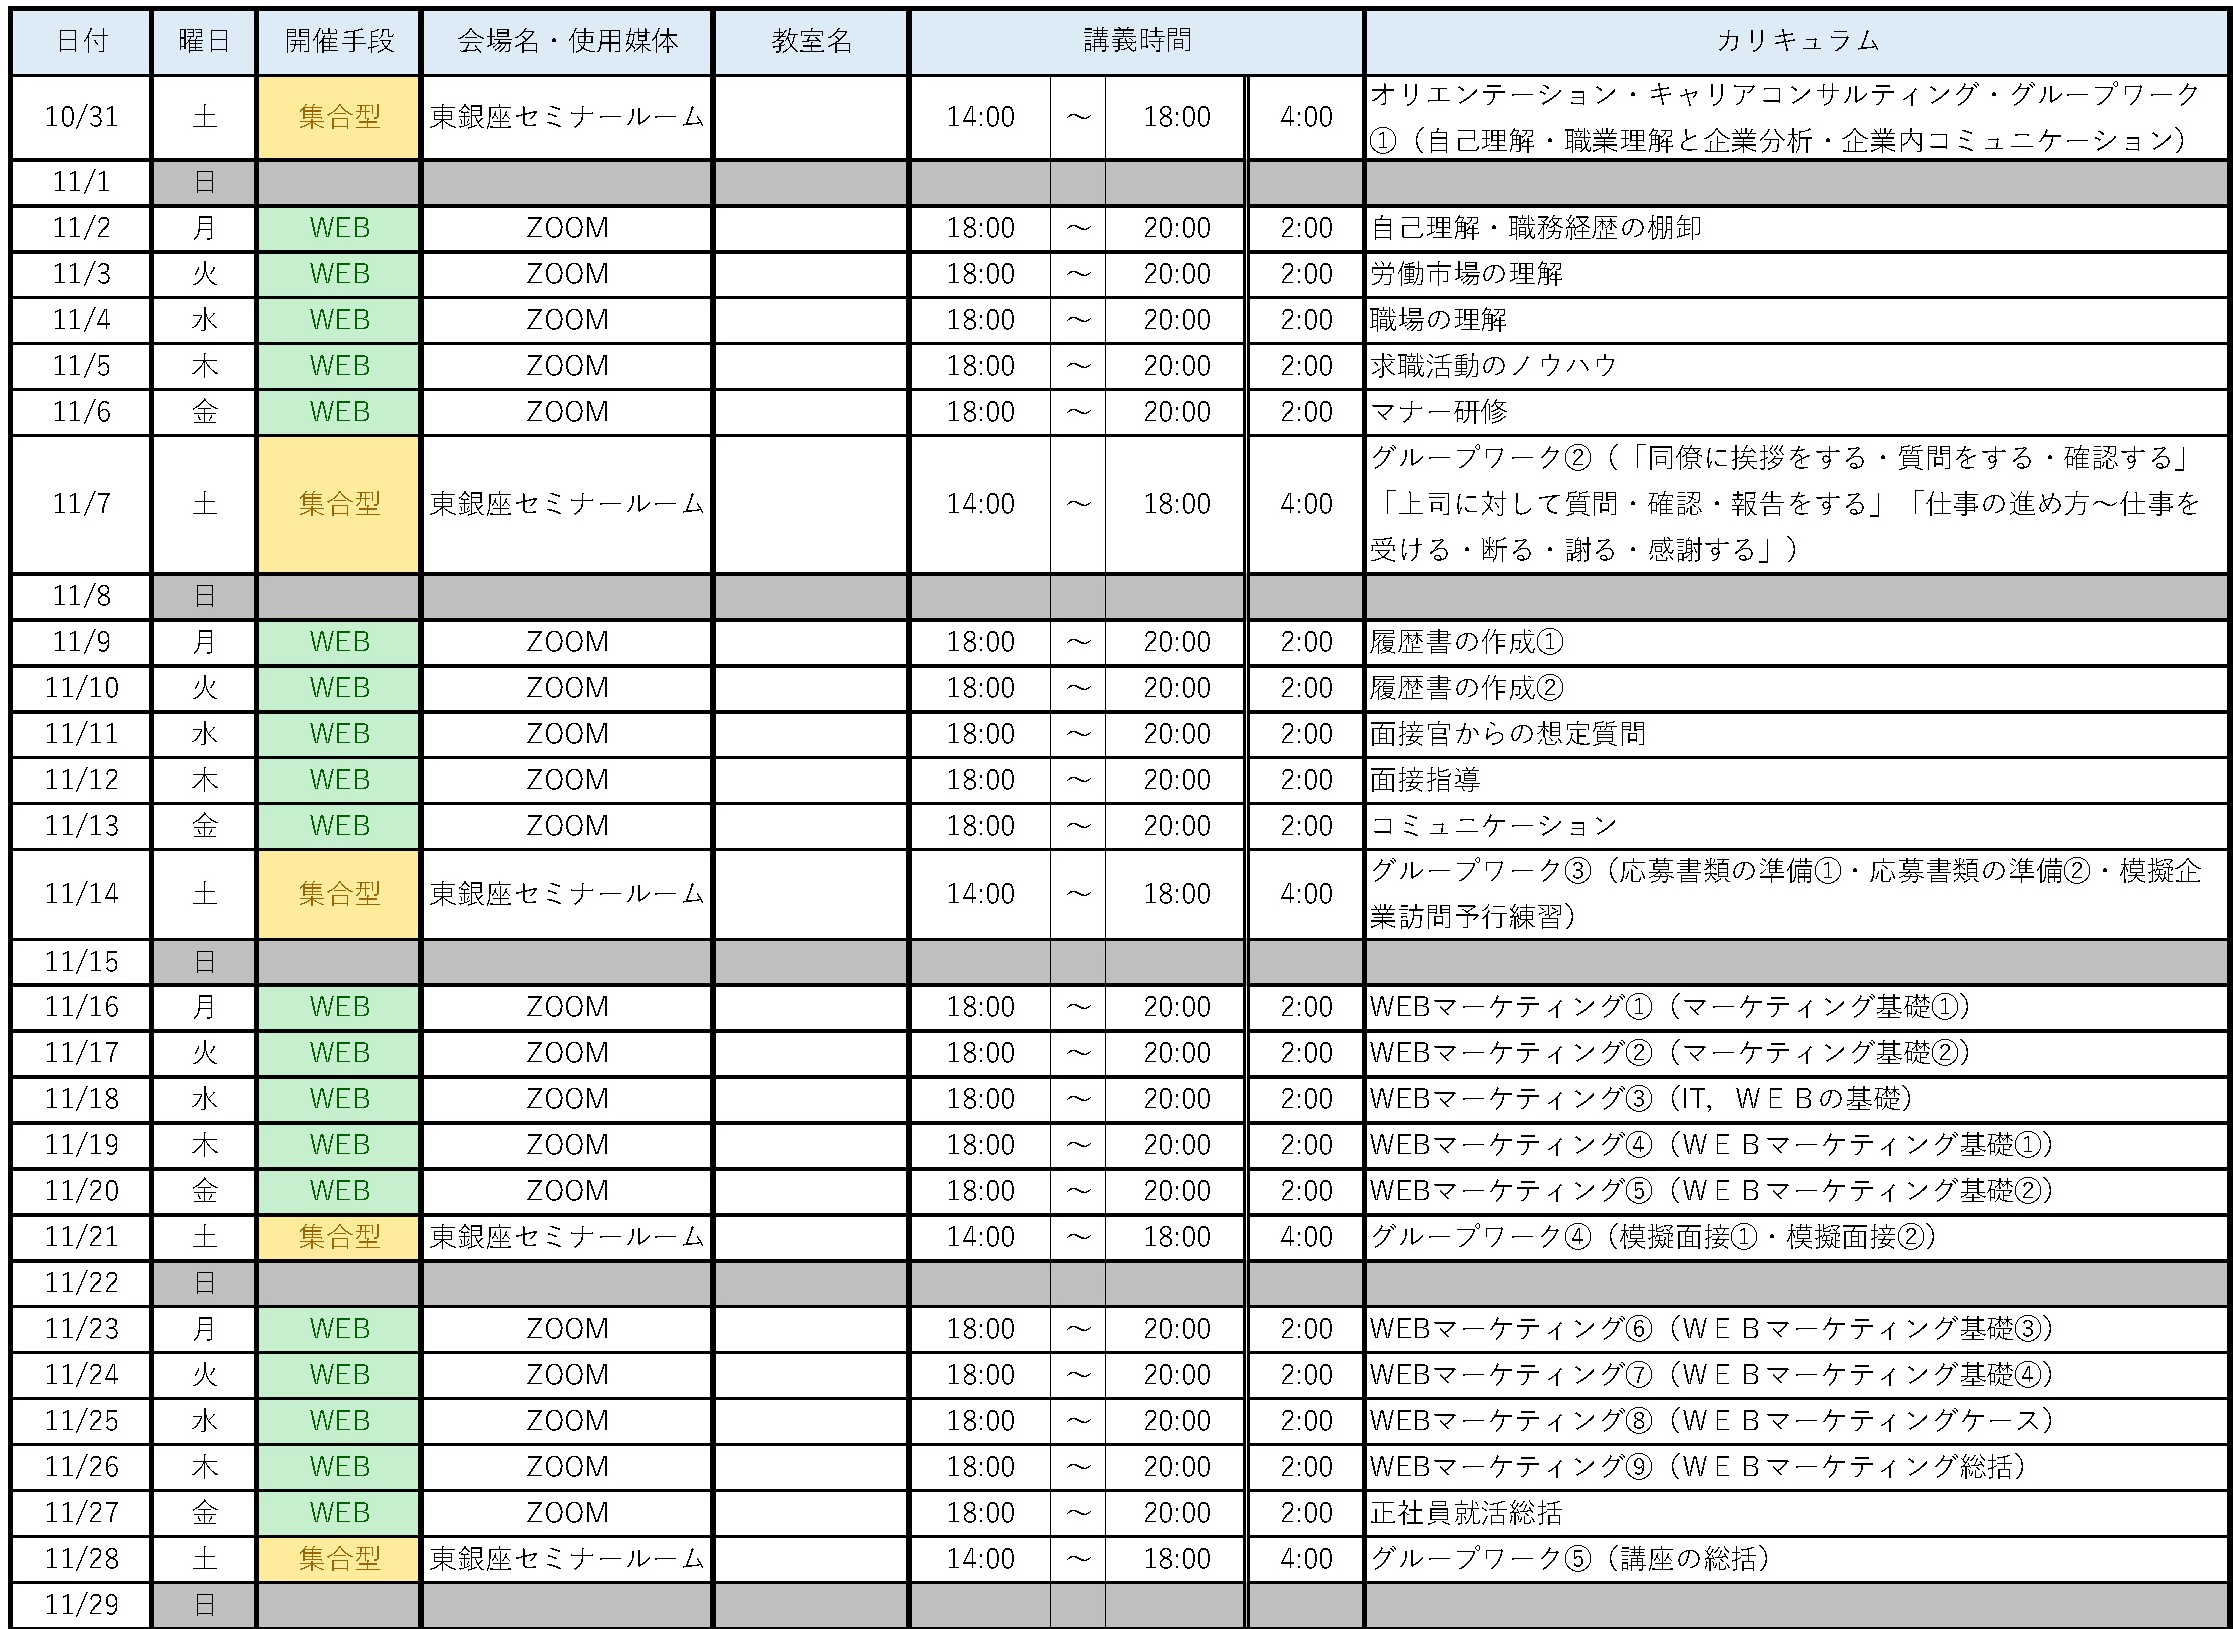 【11月】銀座ver2東銀座②